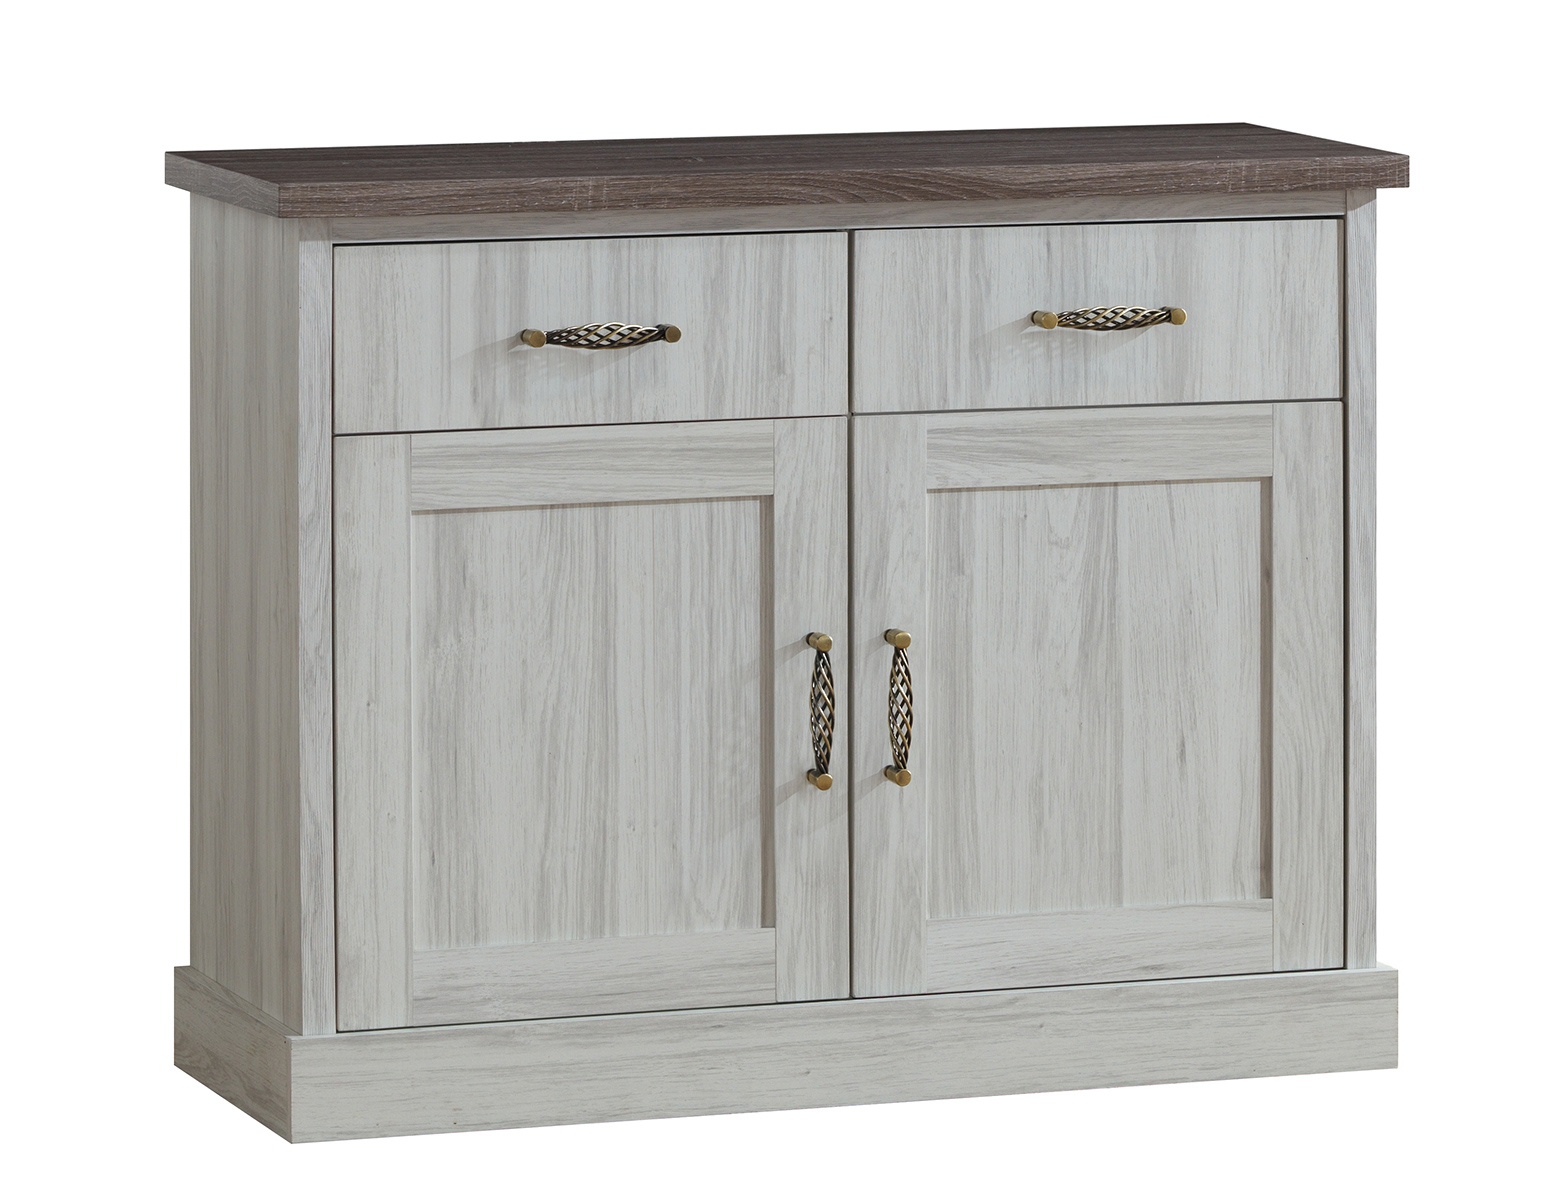 Commode contemporaine 2 portes/2 tiroirs chêne clair/marron Solange